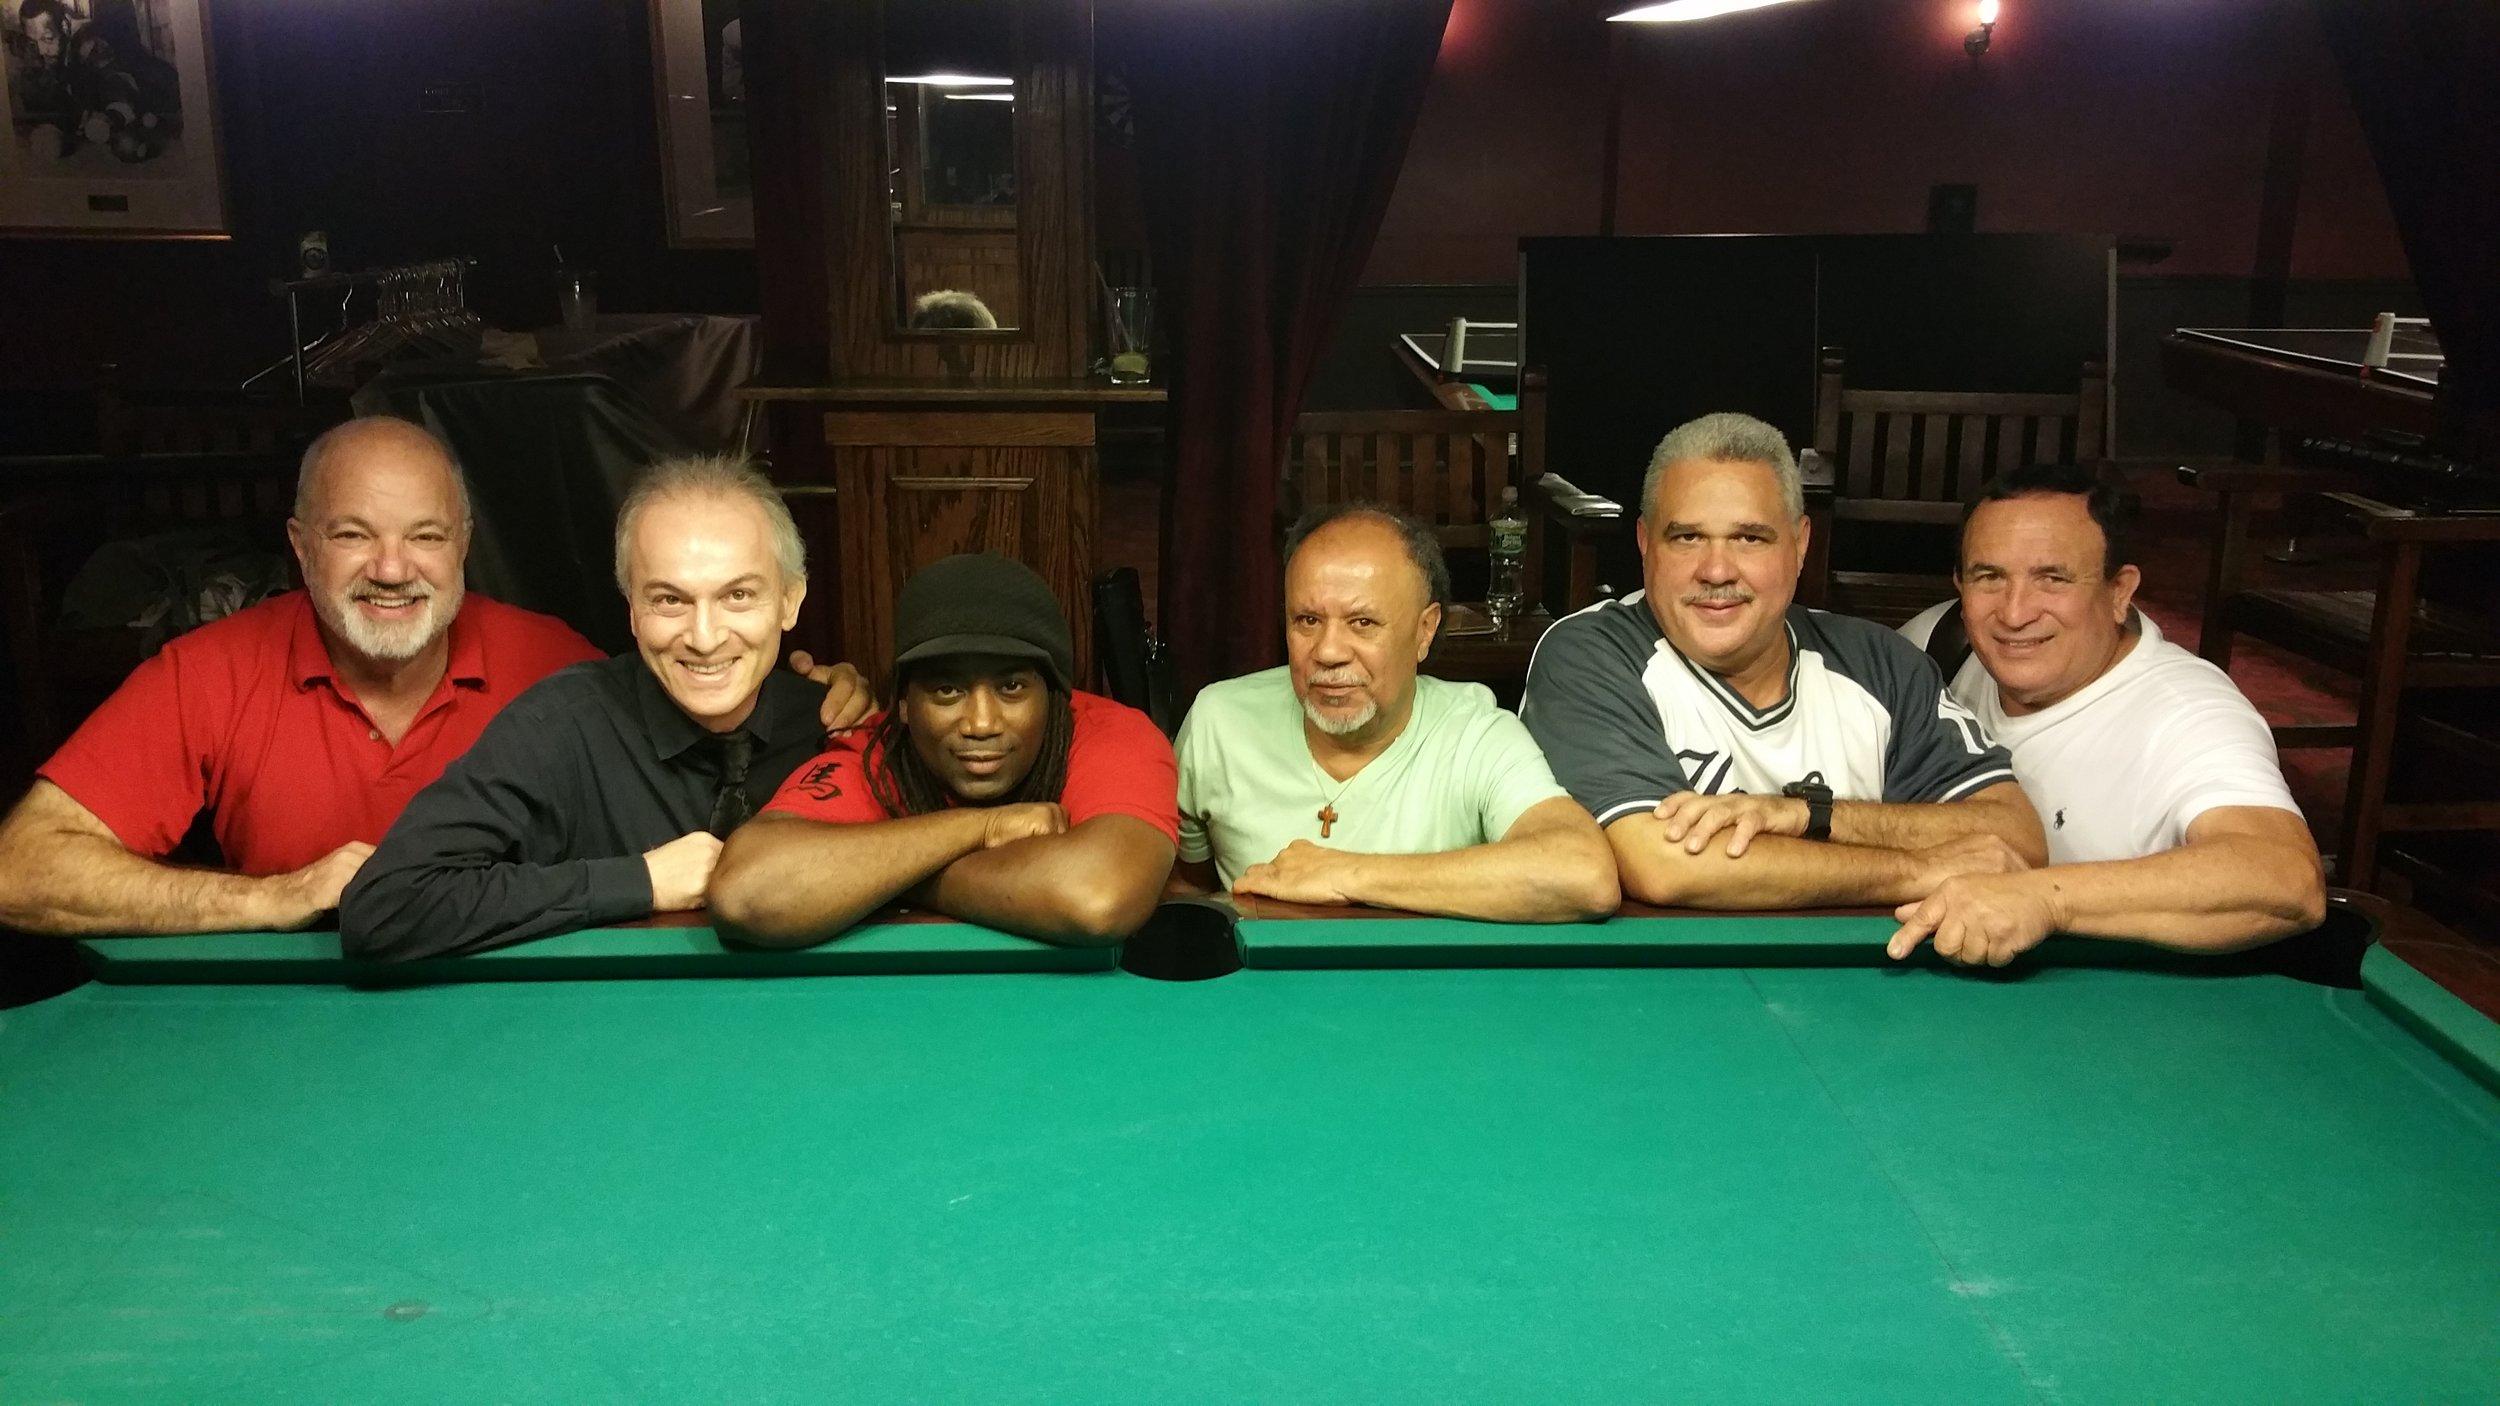 Captain: Neil Kleinman, John Pagano, Mark Cagle, Juan Pellot, Edwin Rivera & Jorge Torres